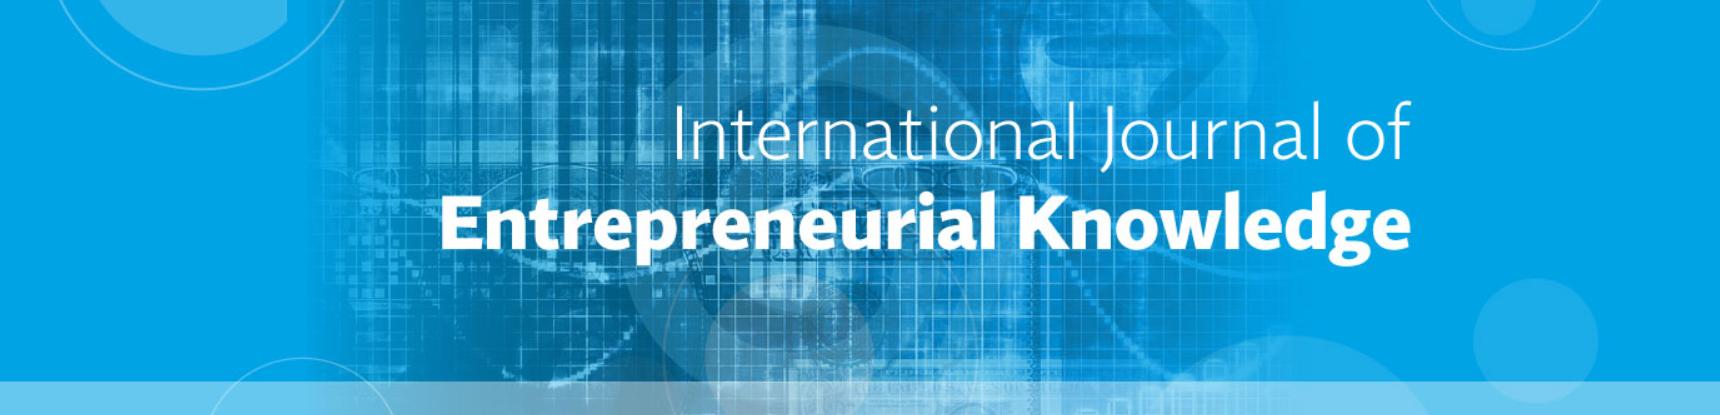 International Journal of Entrepreneurial Knowledge